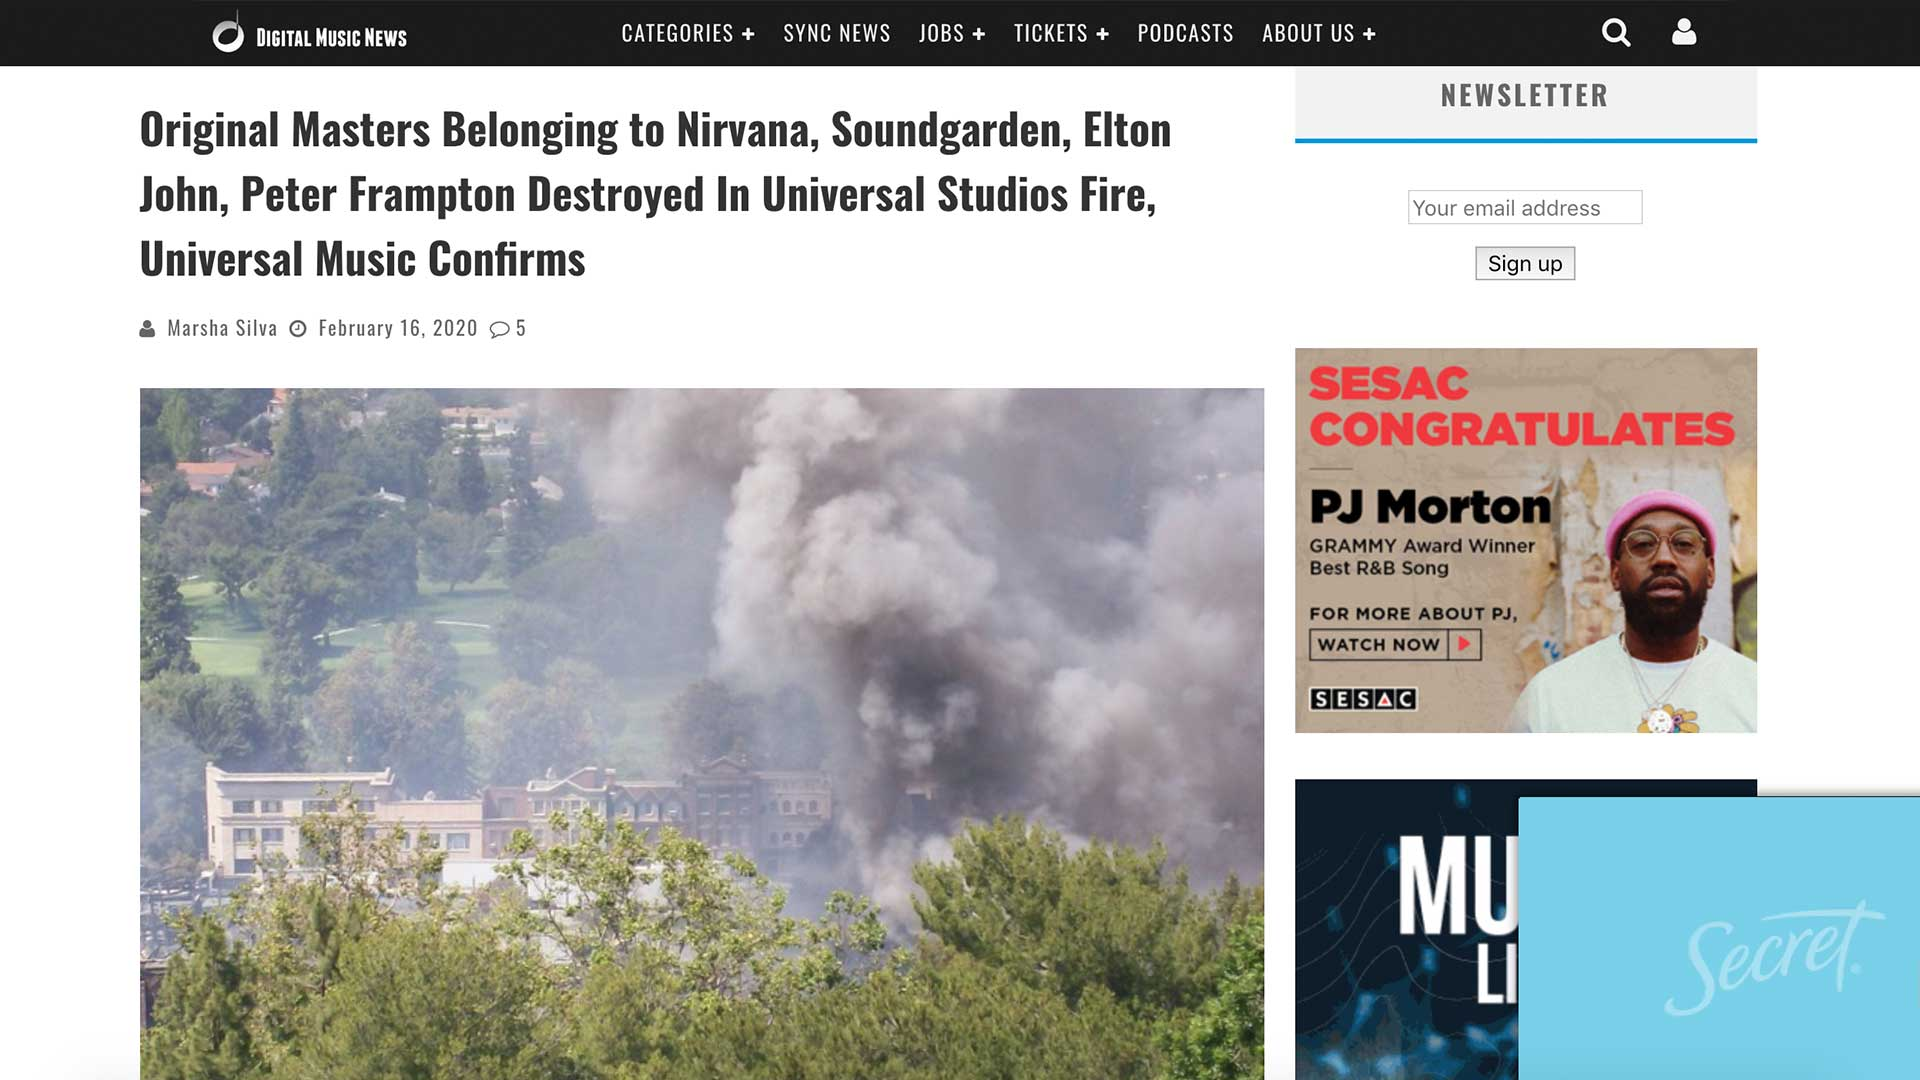 Fairness Rocks News Original Masters Belonging to Nirvana, Soundgarden, Elton John, Peter Frampton Destroyed In Universal Studios Fire, Universal Music Confirms